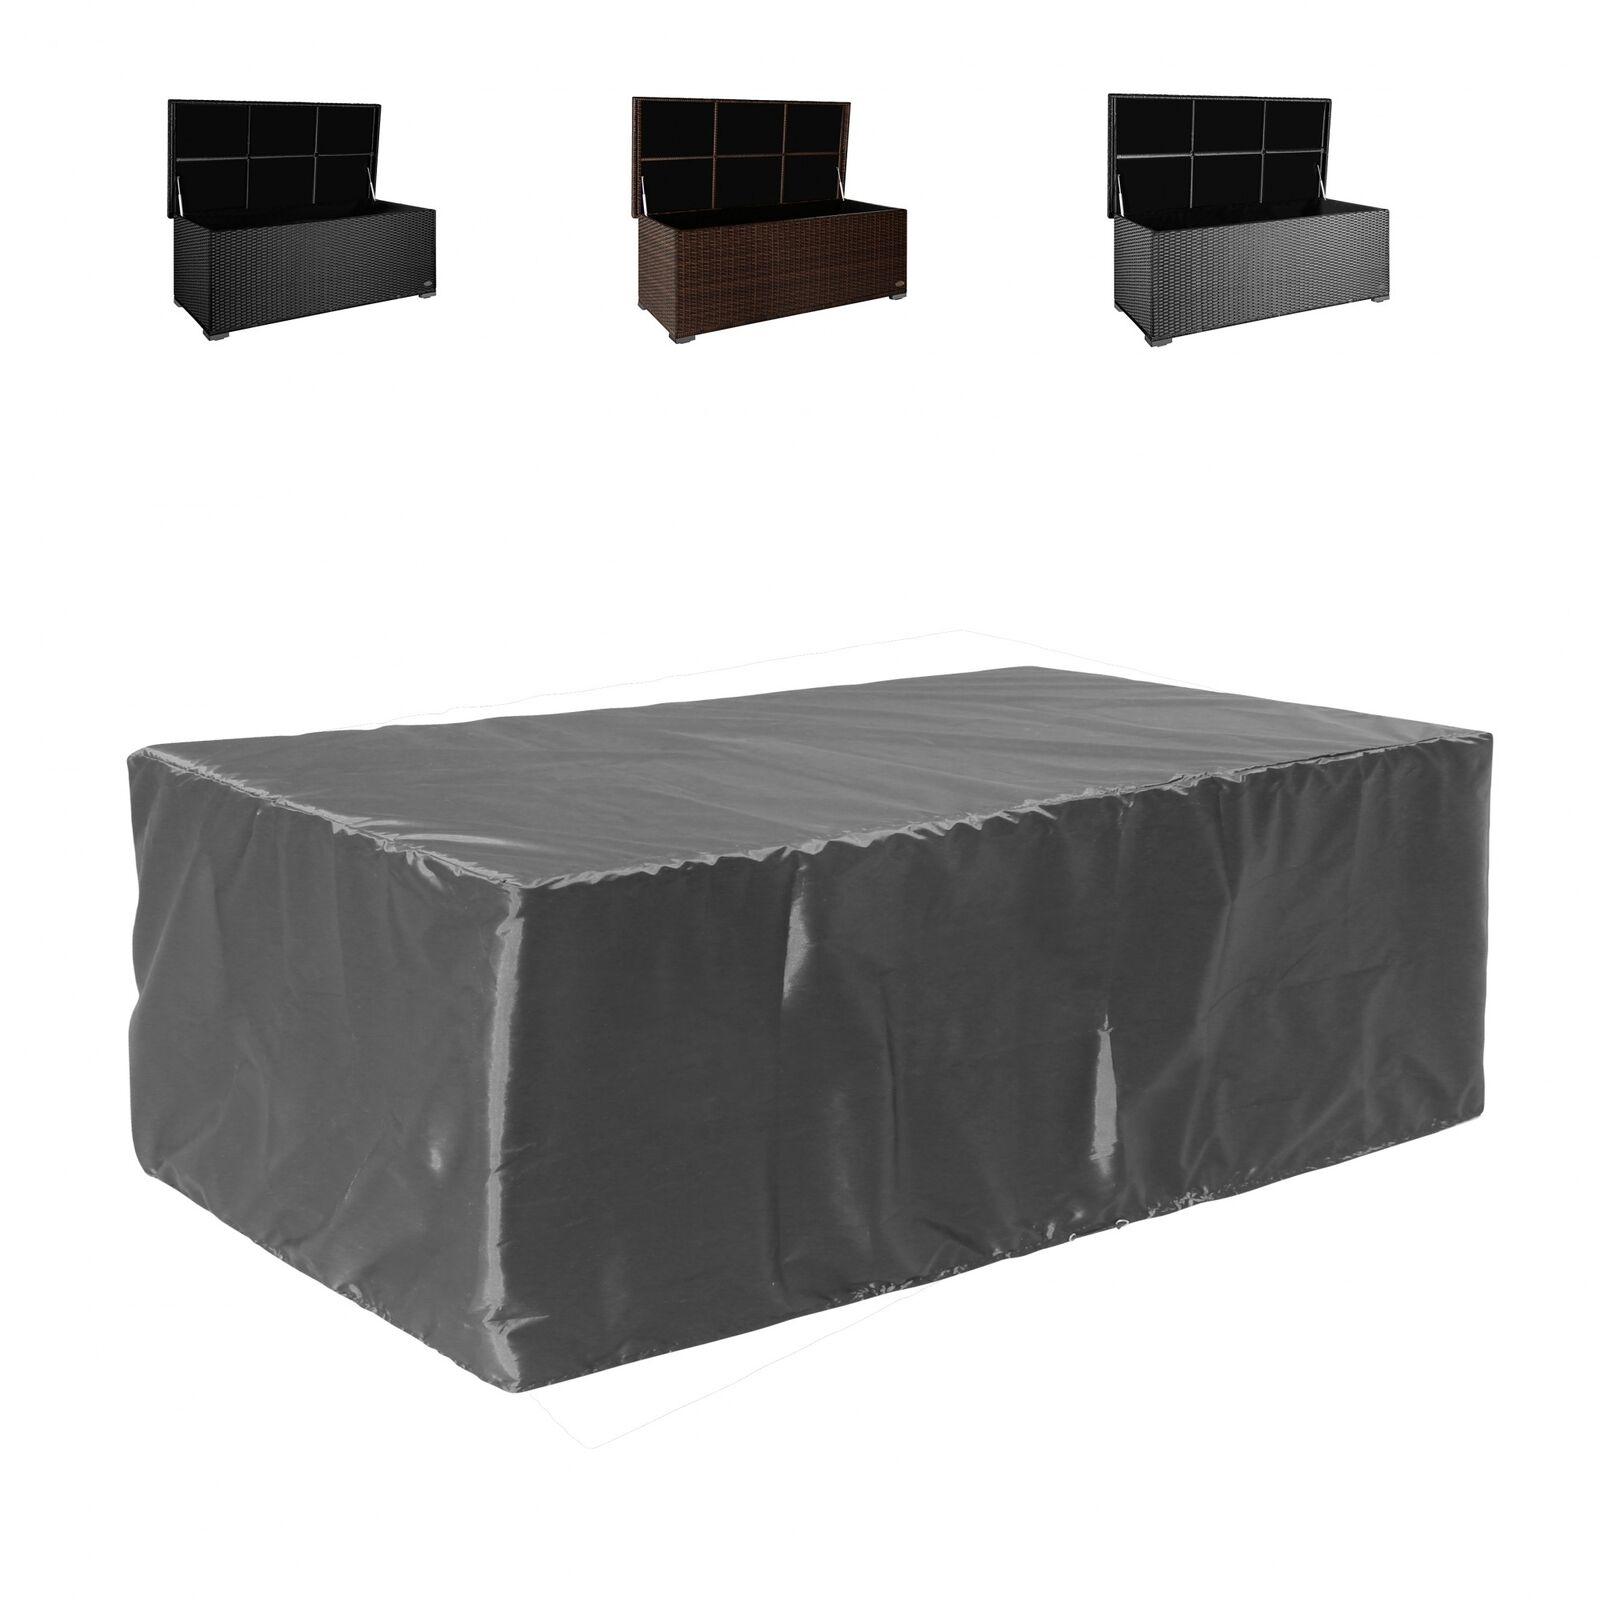 Funda projoectora cubierta baúl para sentarse tumbona silla tumbona arcón cubierta